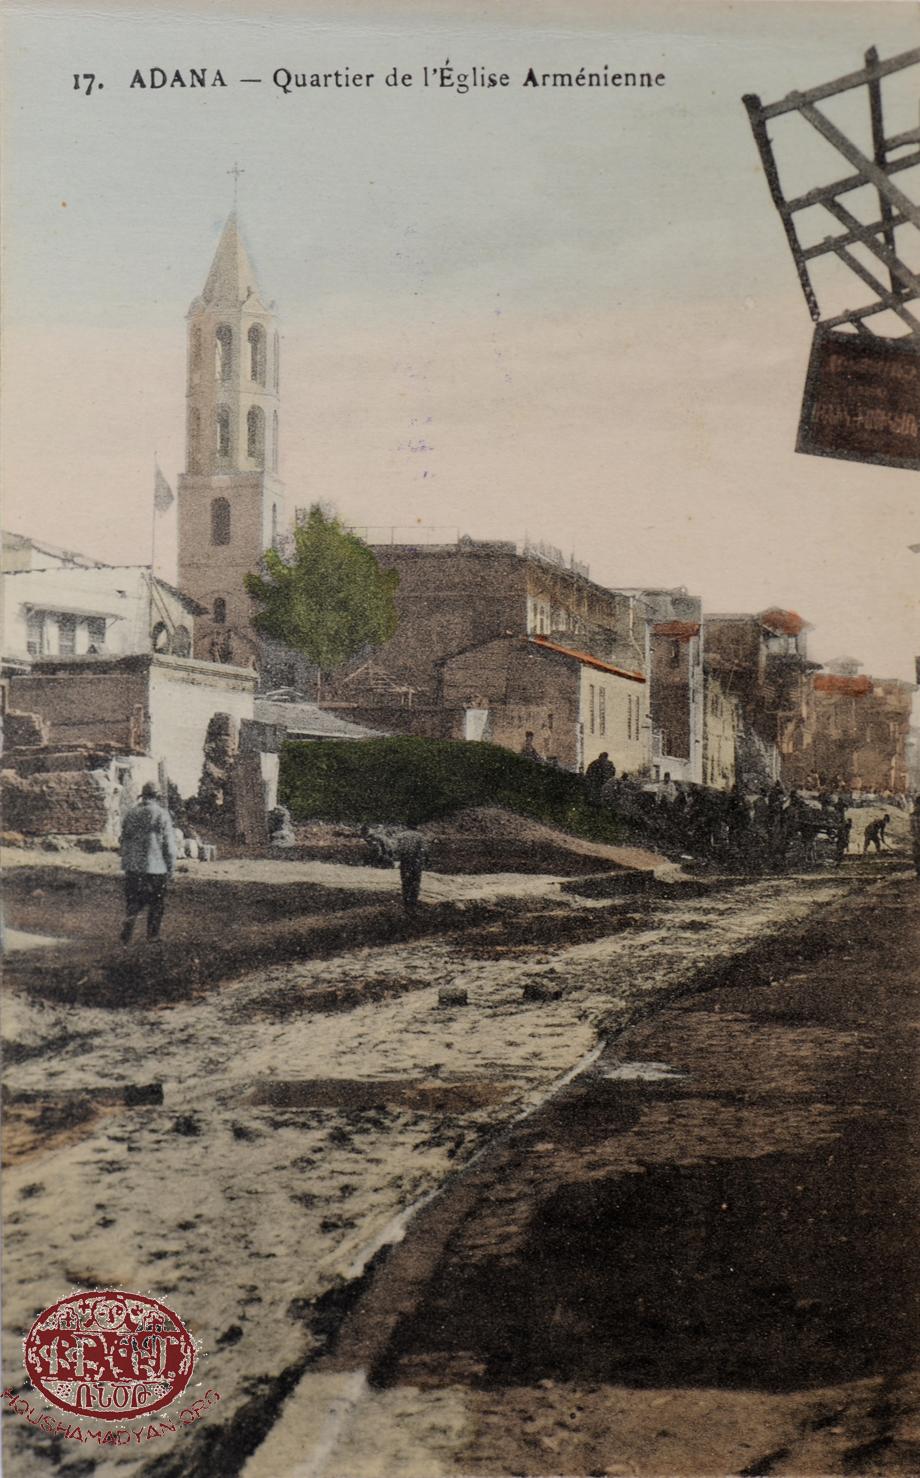 Adana. The Armenian quarter and Protestant church